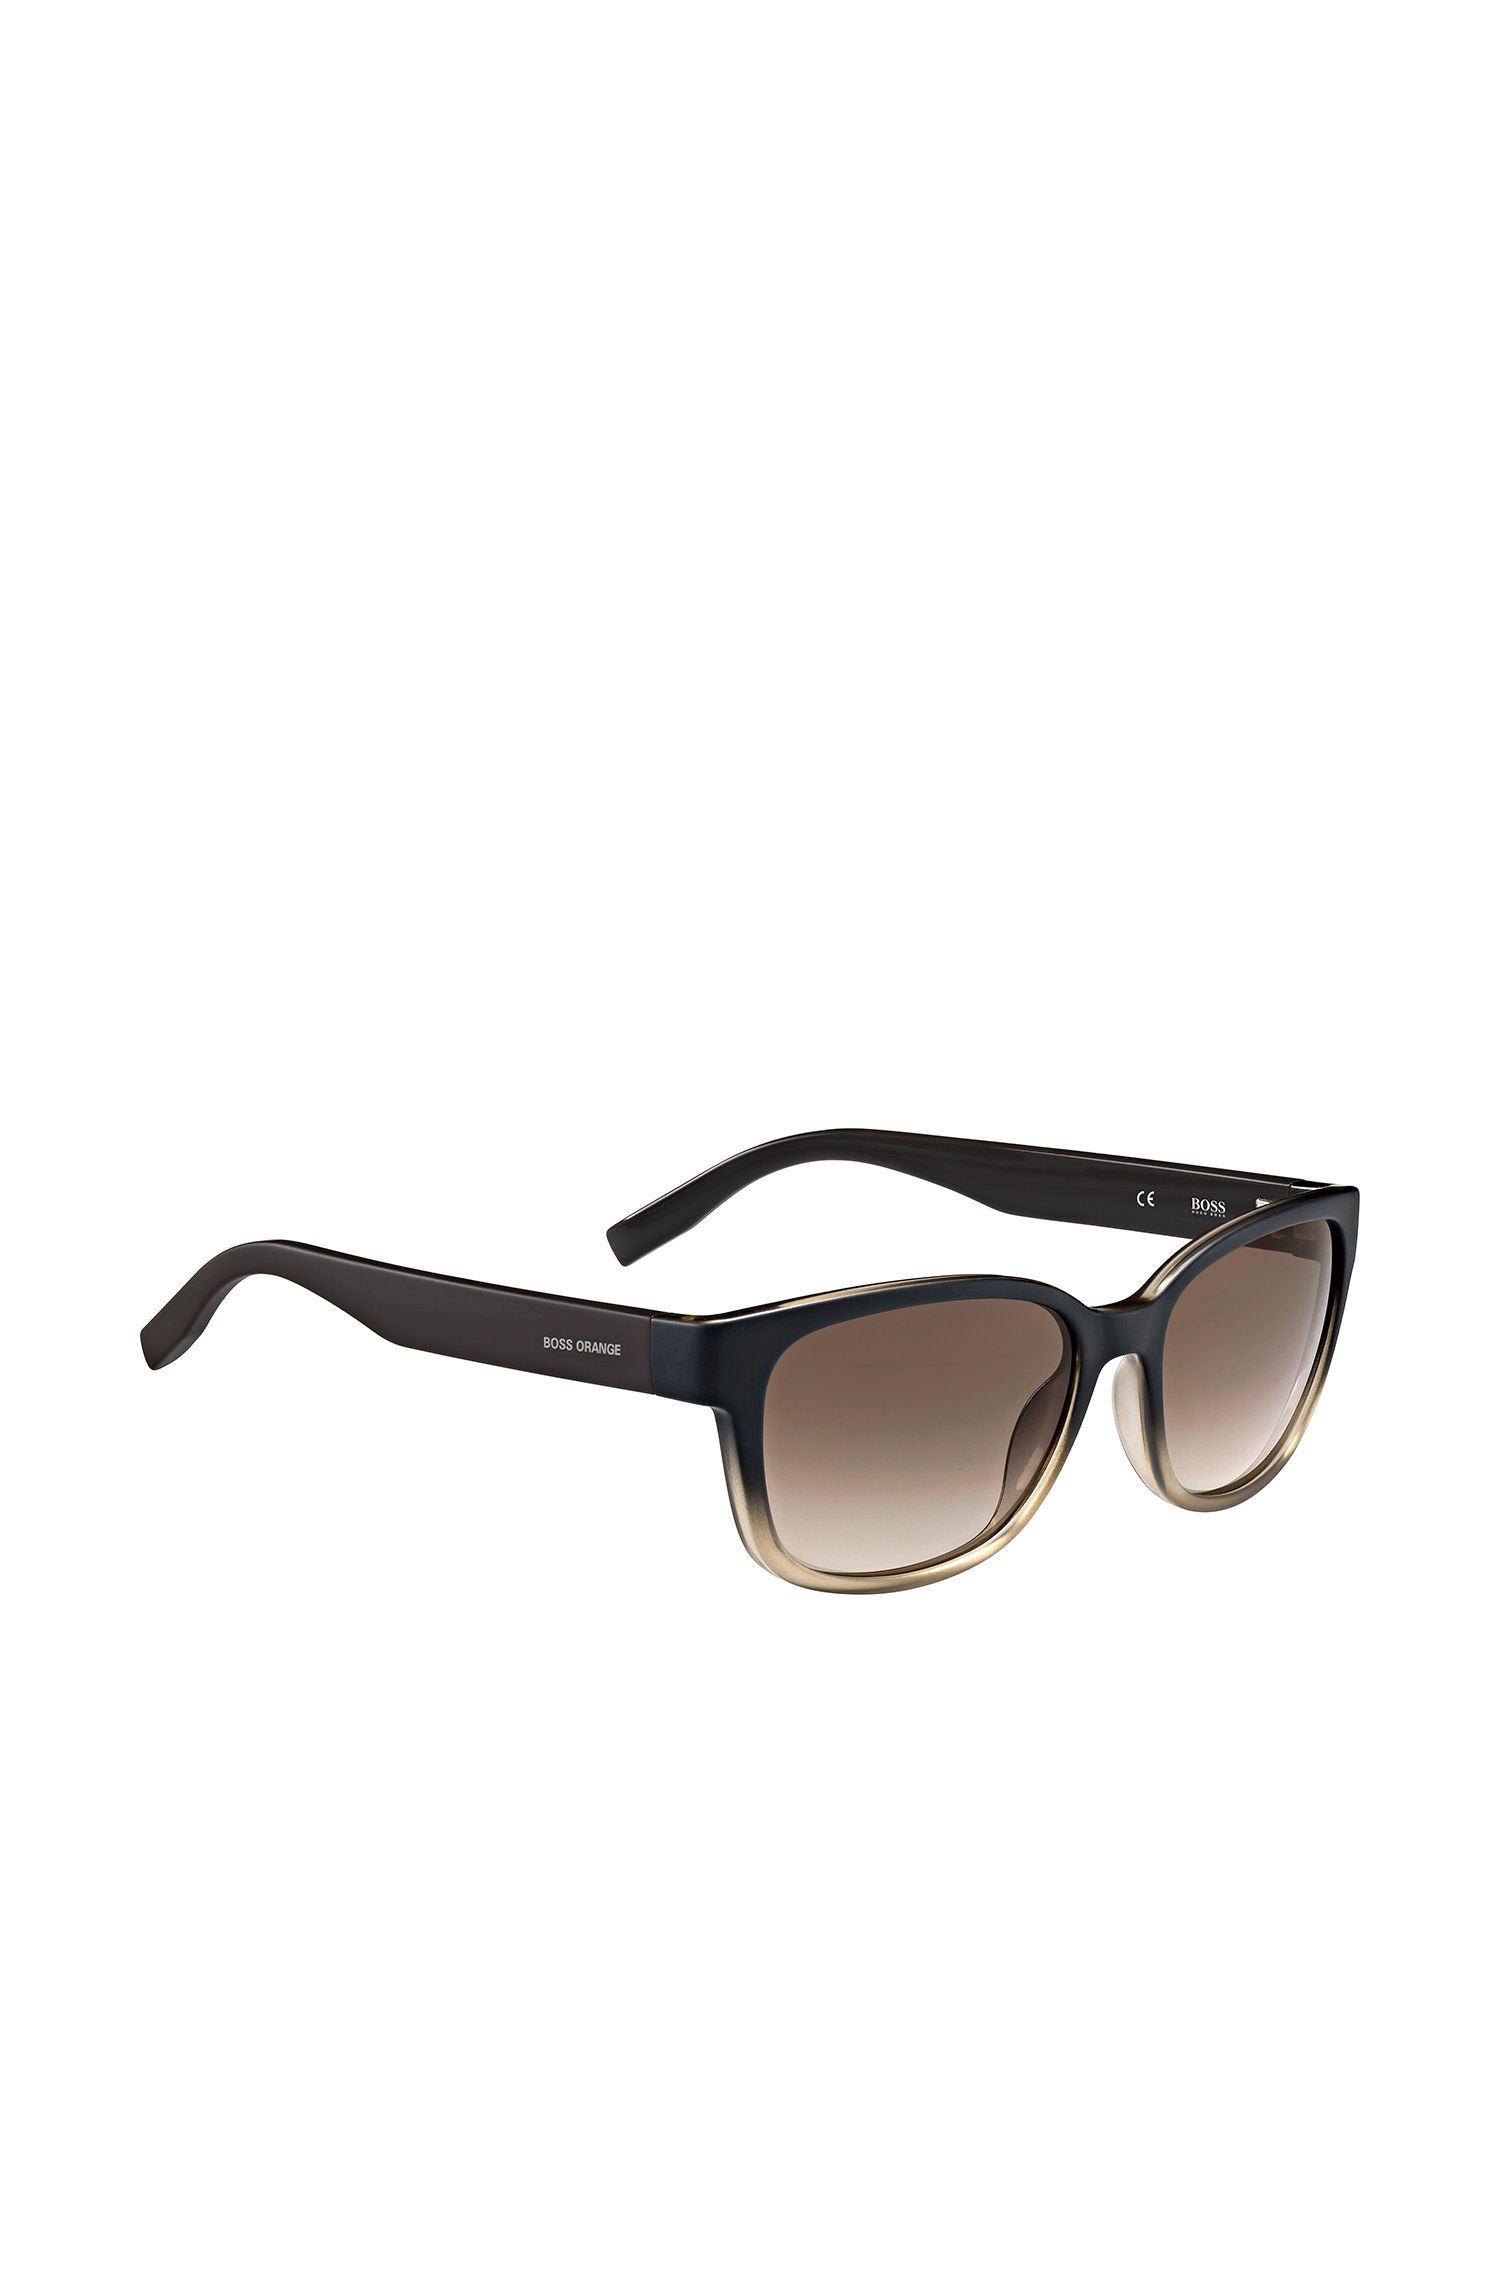 Occhiali da sole marroni in stile Cat Eye: 'BO0251/1'